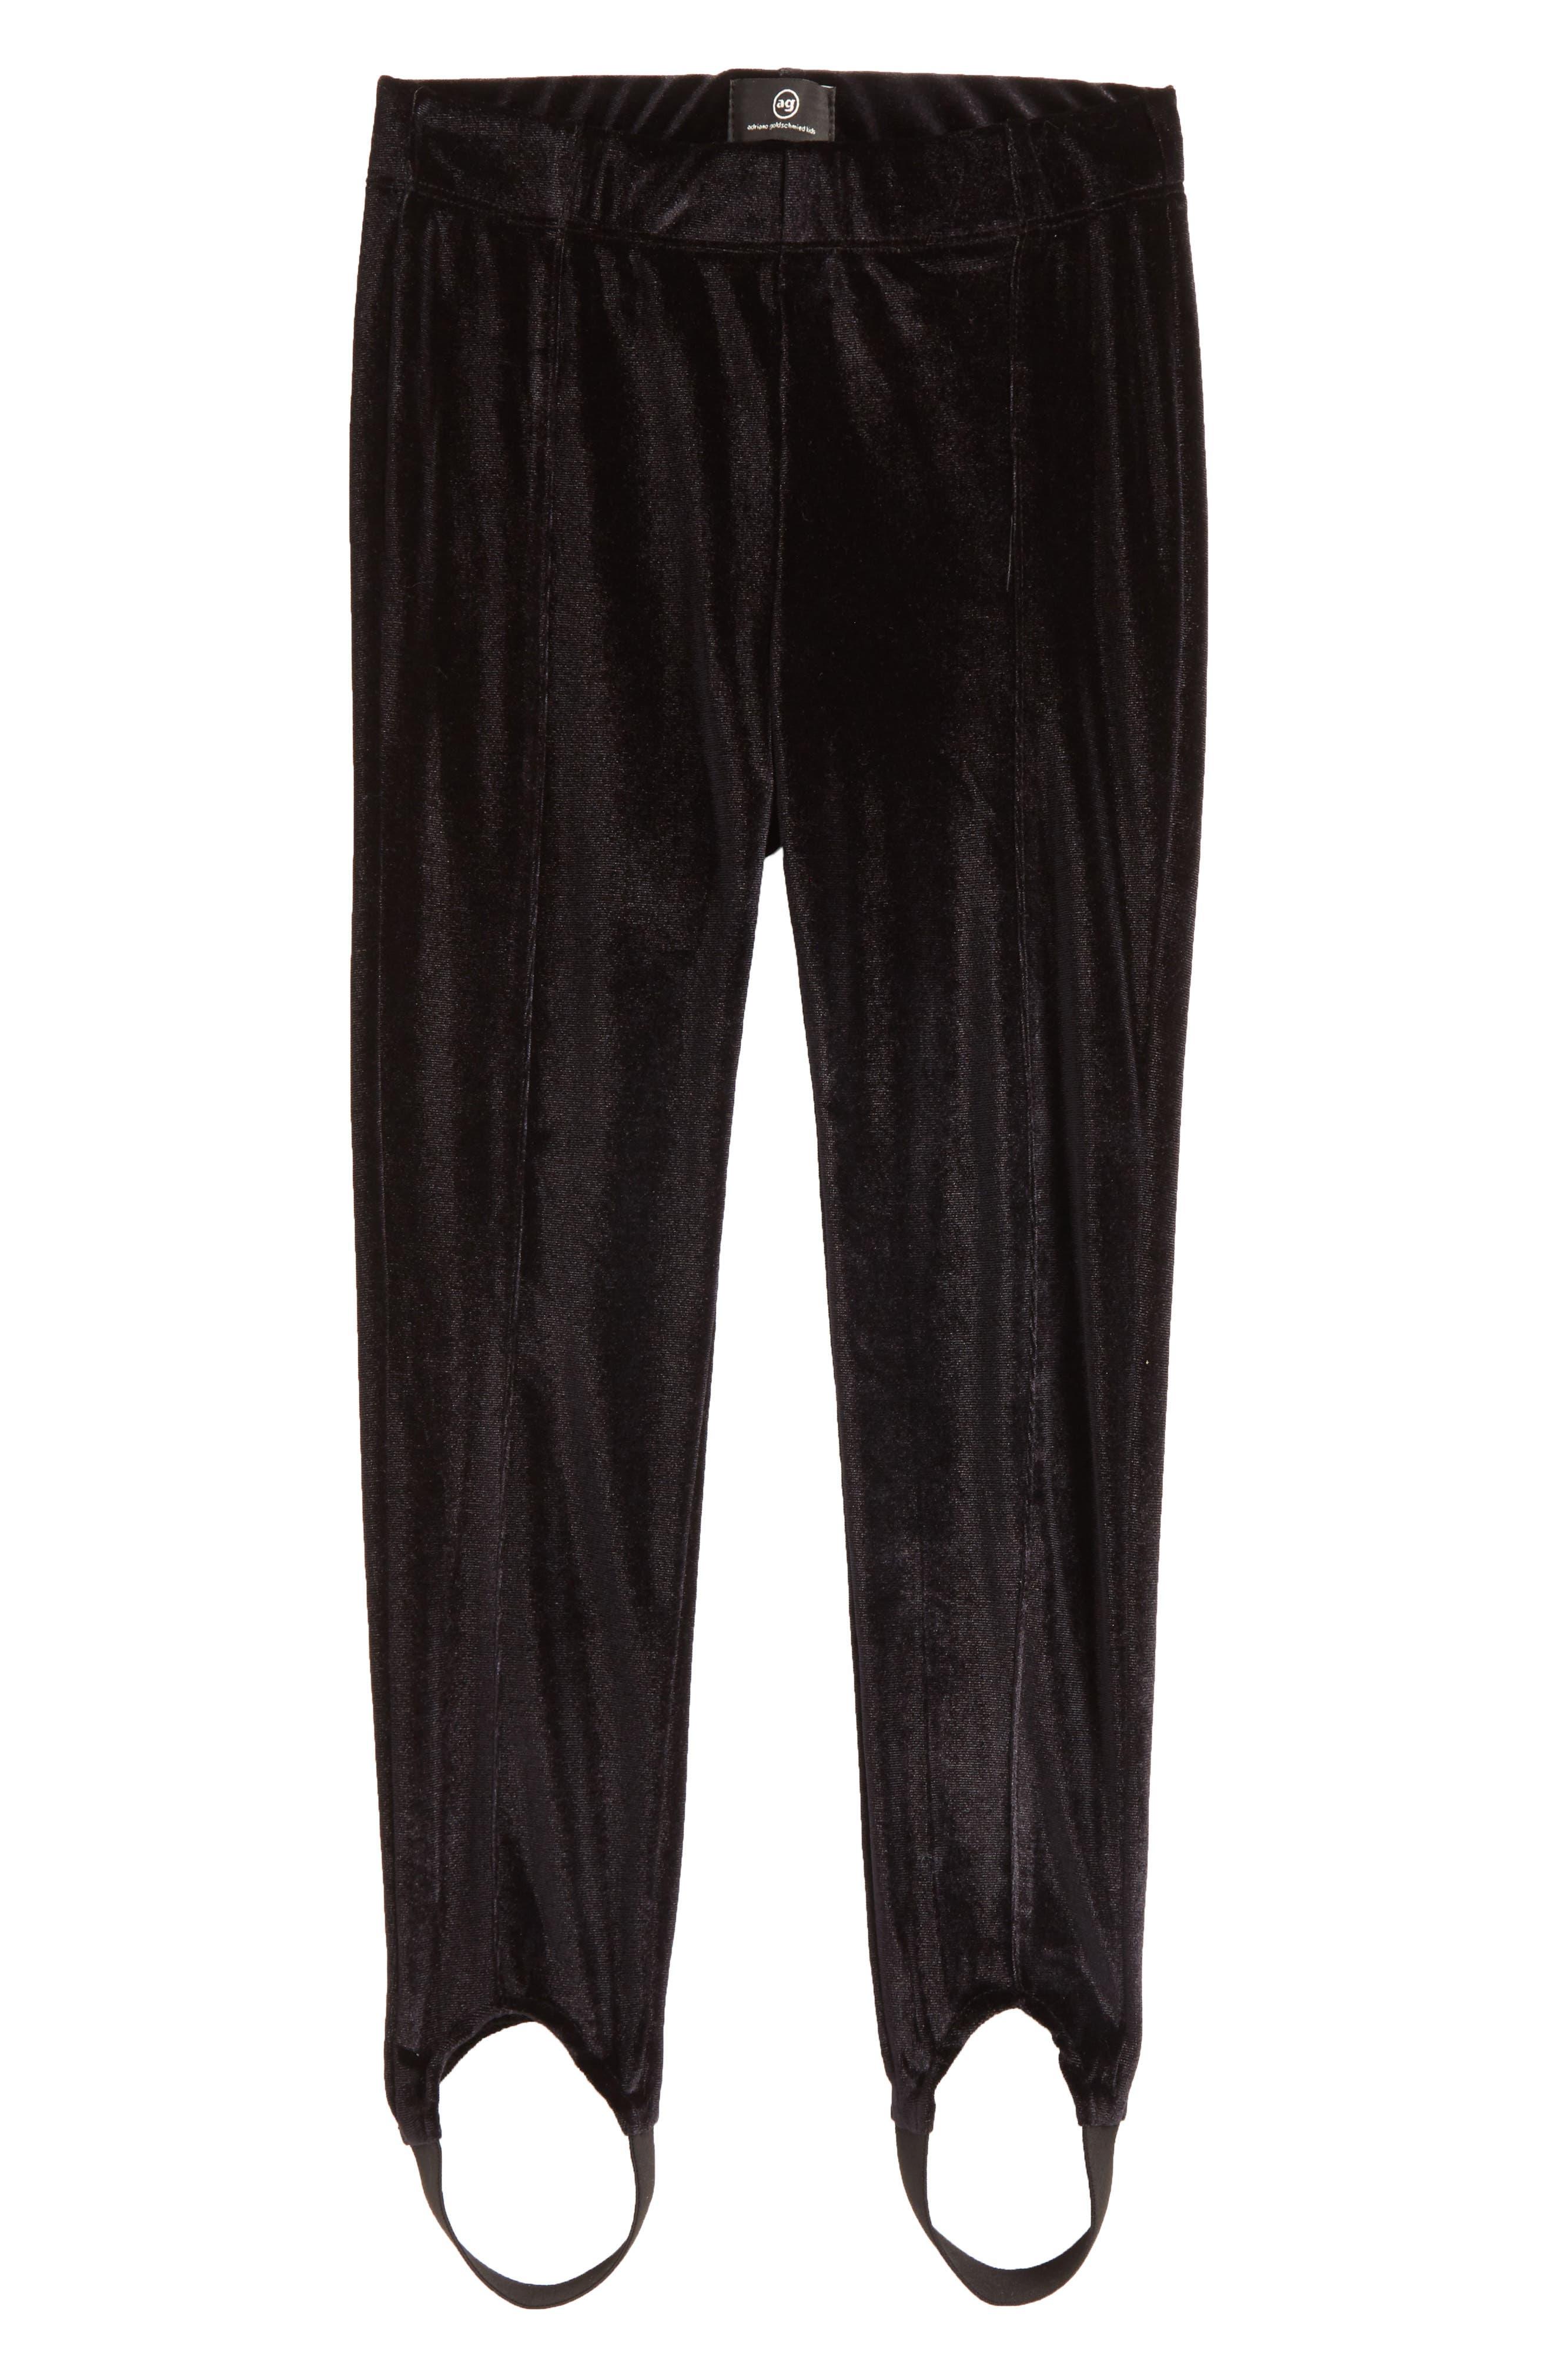 Velvet Stirrup Pants,                             Main thumbnail 1, color,                             001